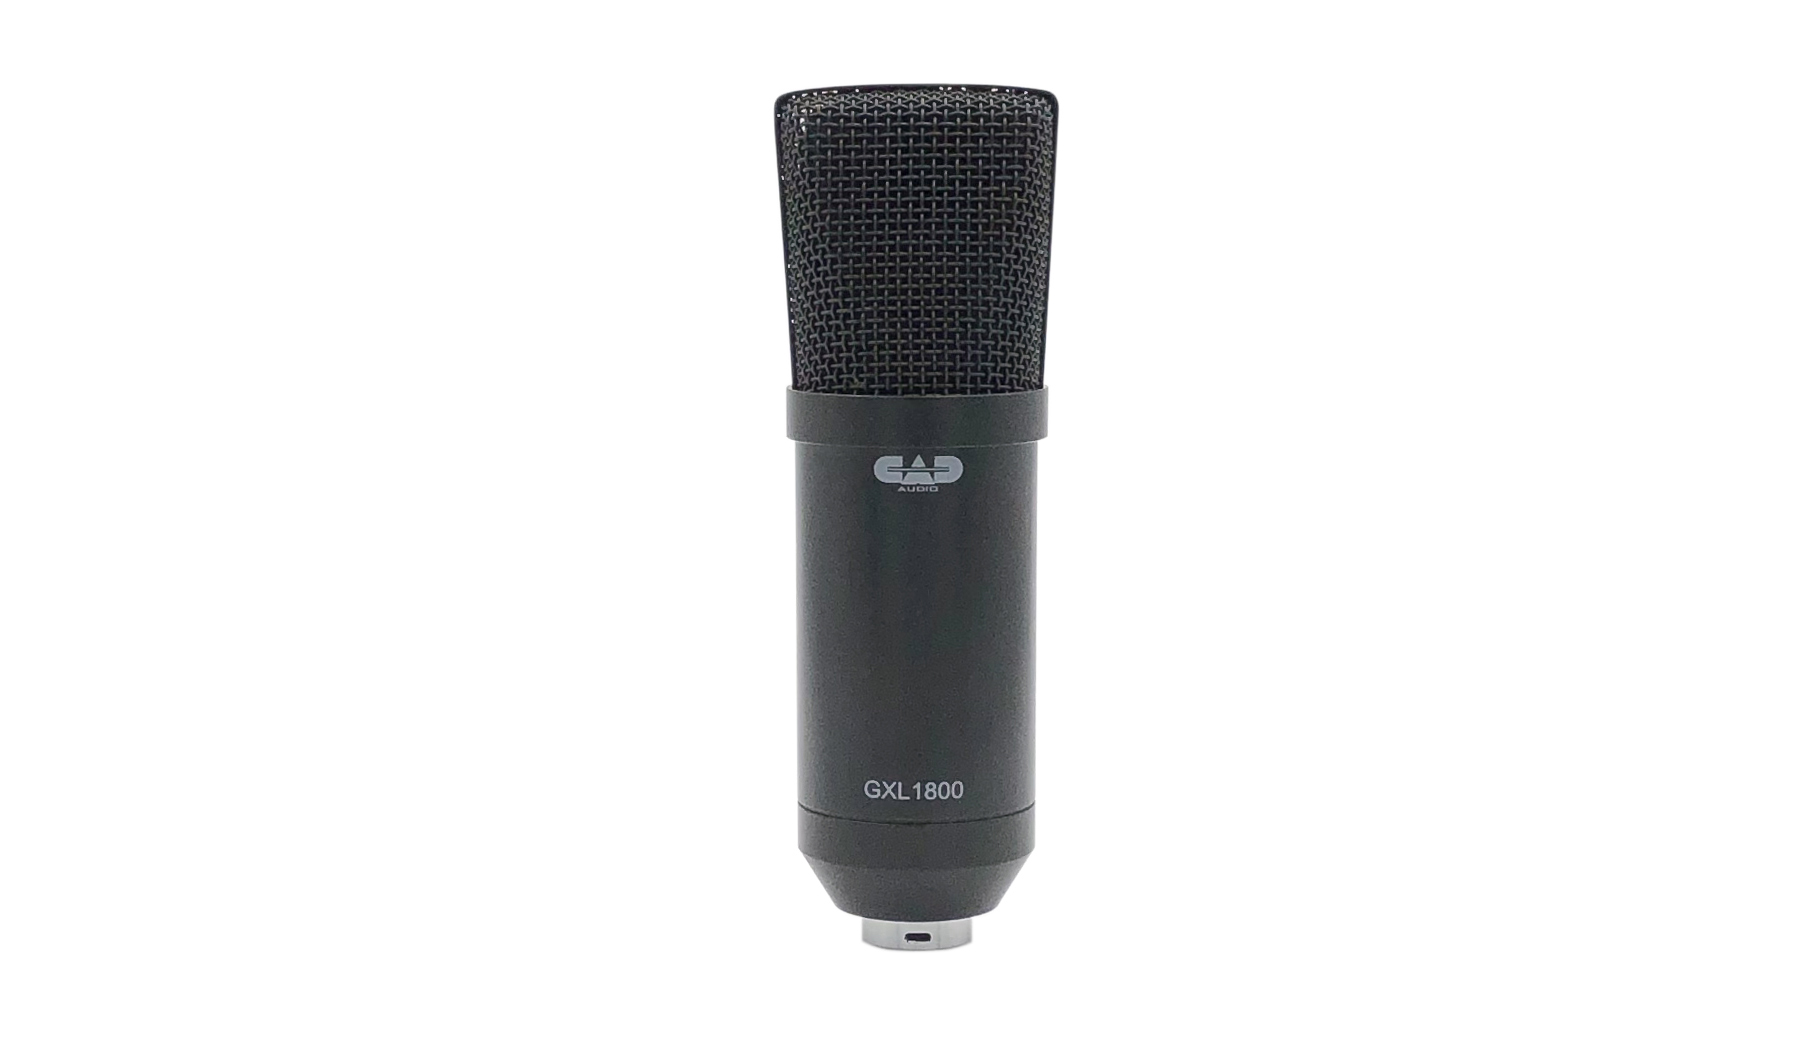 GXL1800